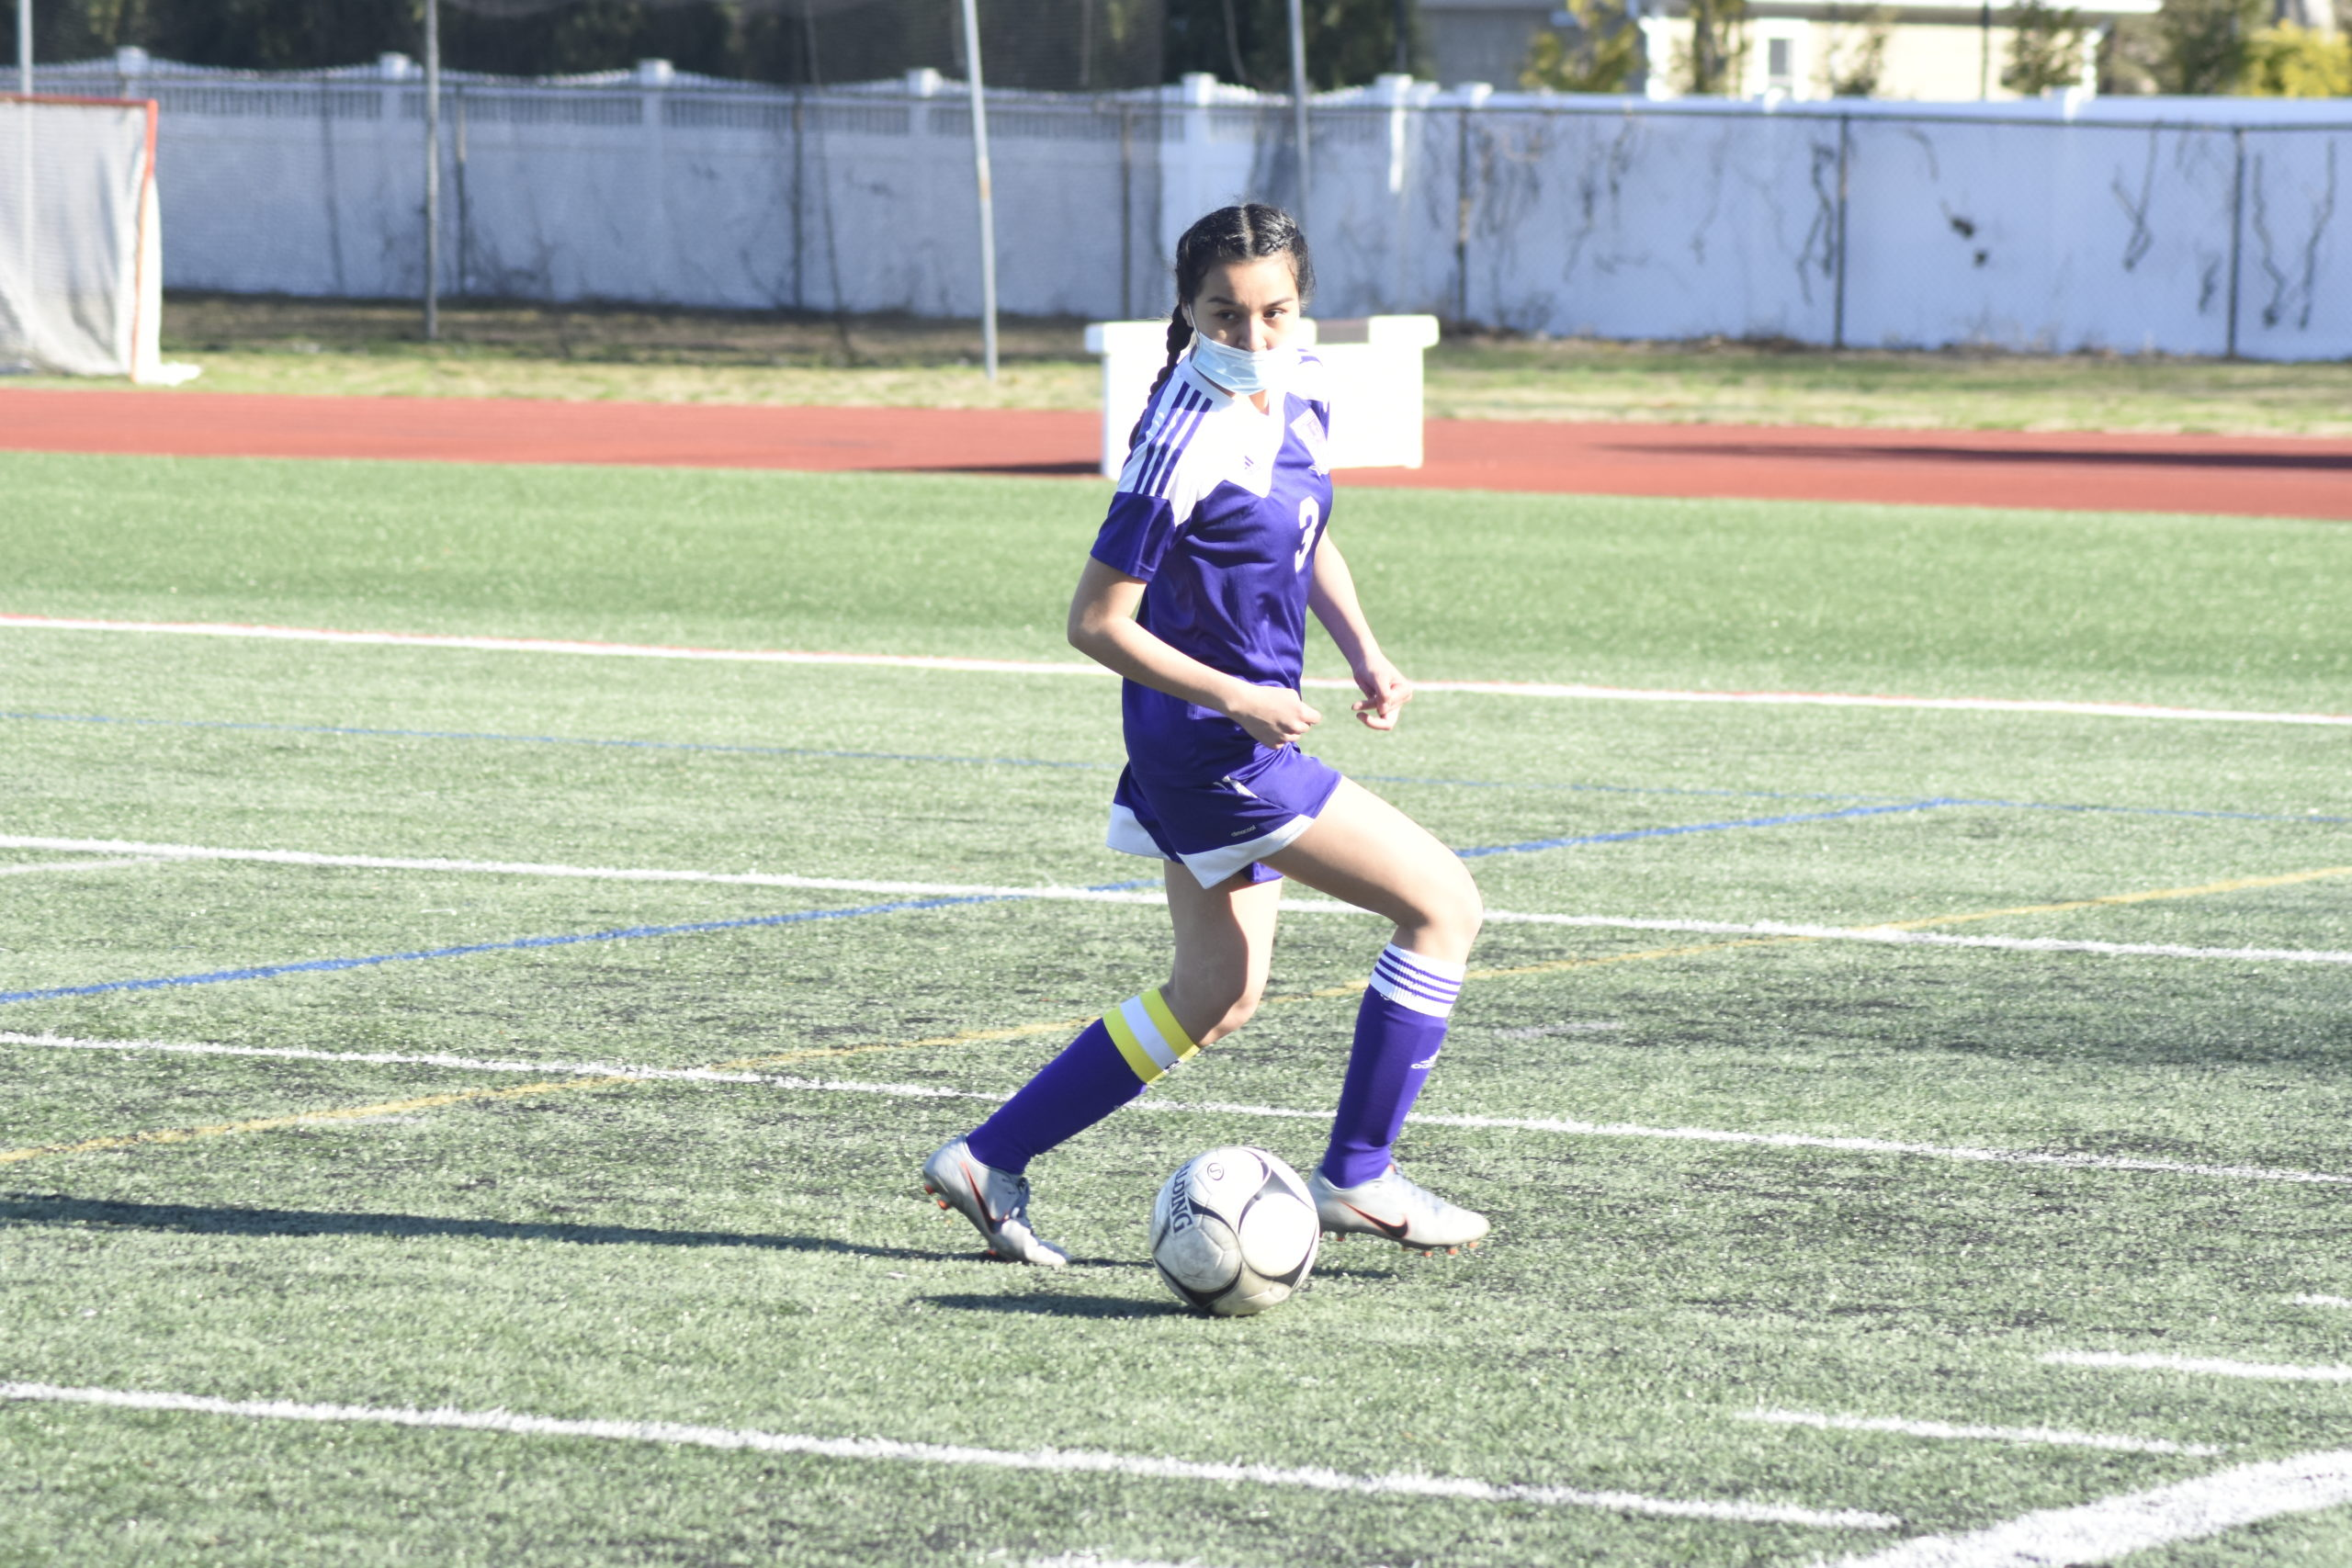 Hampton Bays senior tri-captain Jennifer Serna plays the ball deep in her team's defensive end.